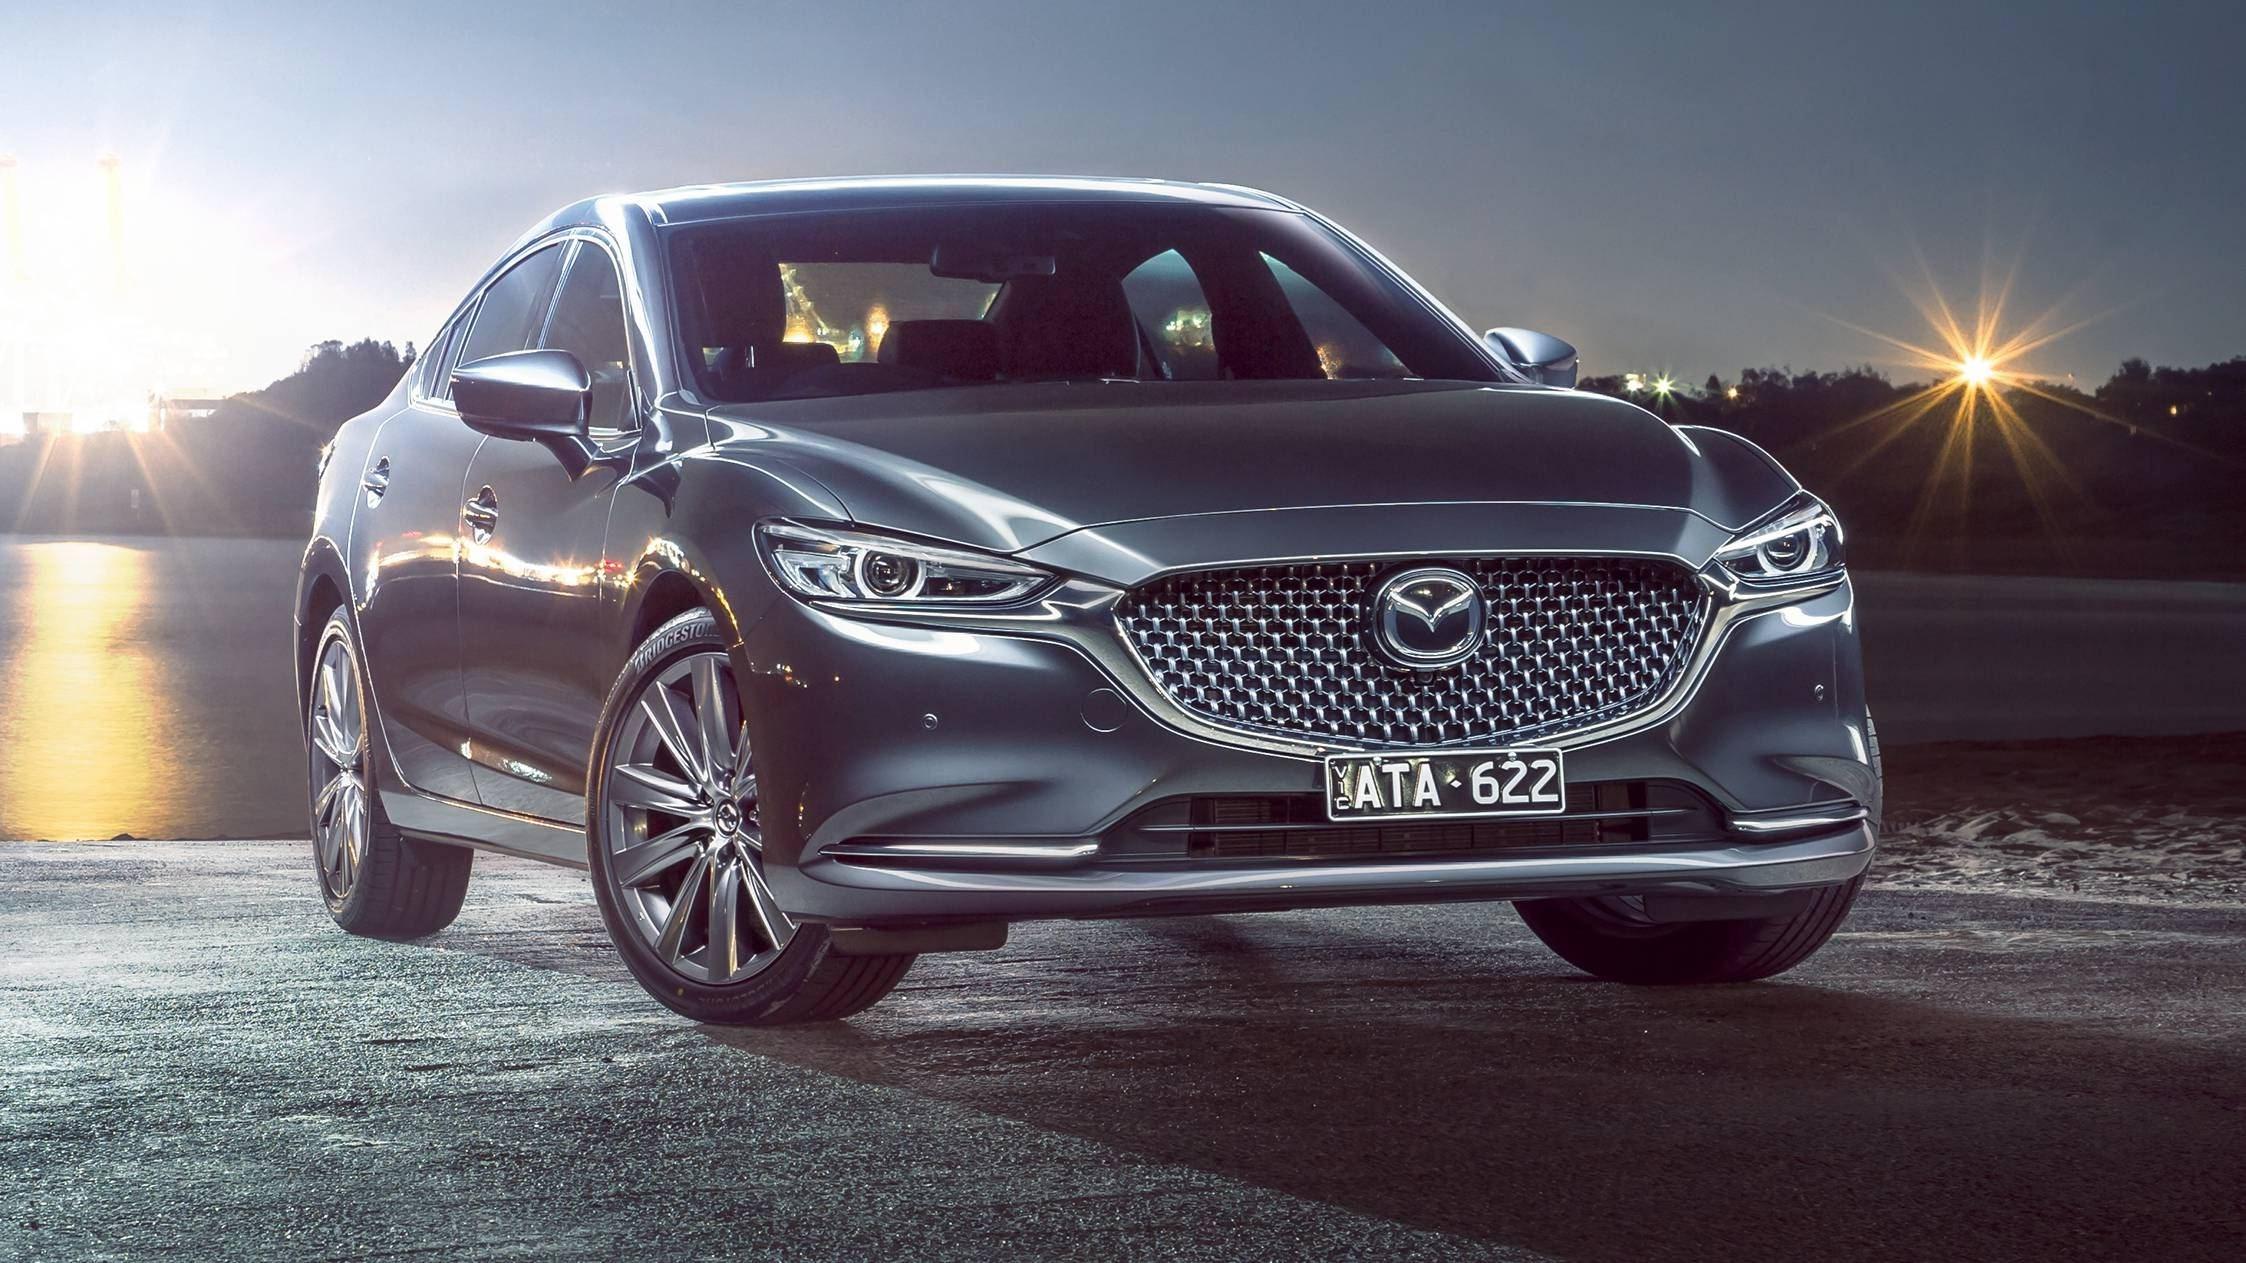 Turbo'd-Up 2018 Mazda6 Detailed For Australia Thumbnail